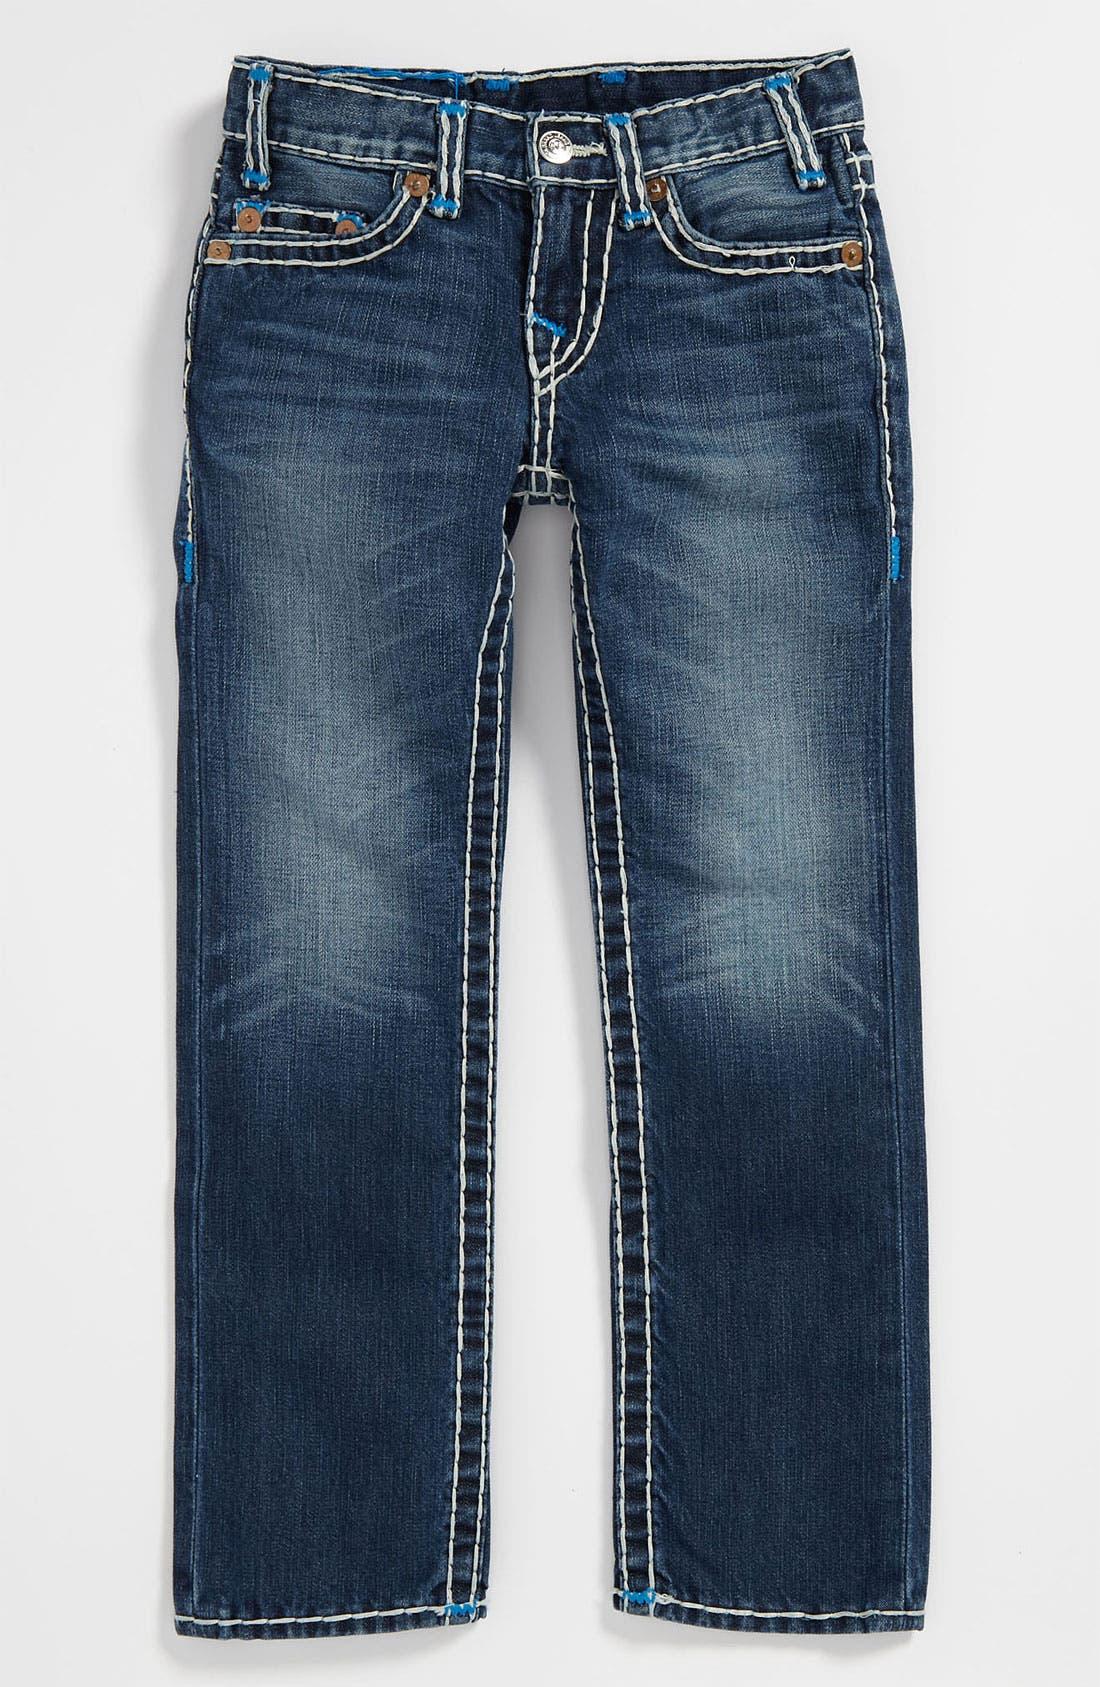 Alternate Image 2  - True Religion Brand Jeans 'Logan Super T' Jeans (Little Boys)